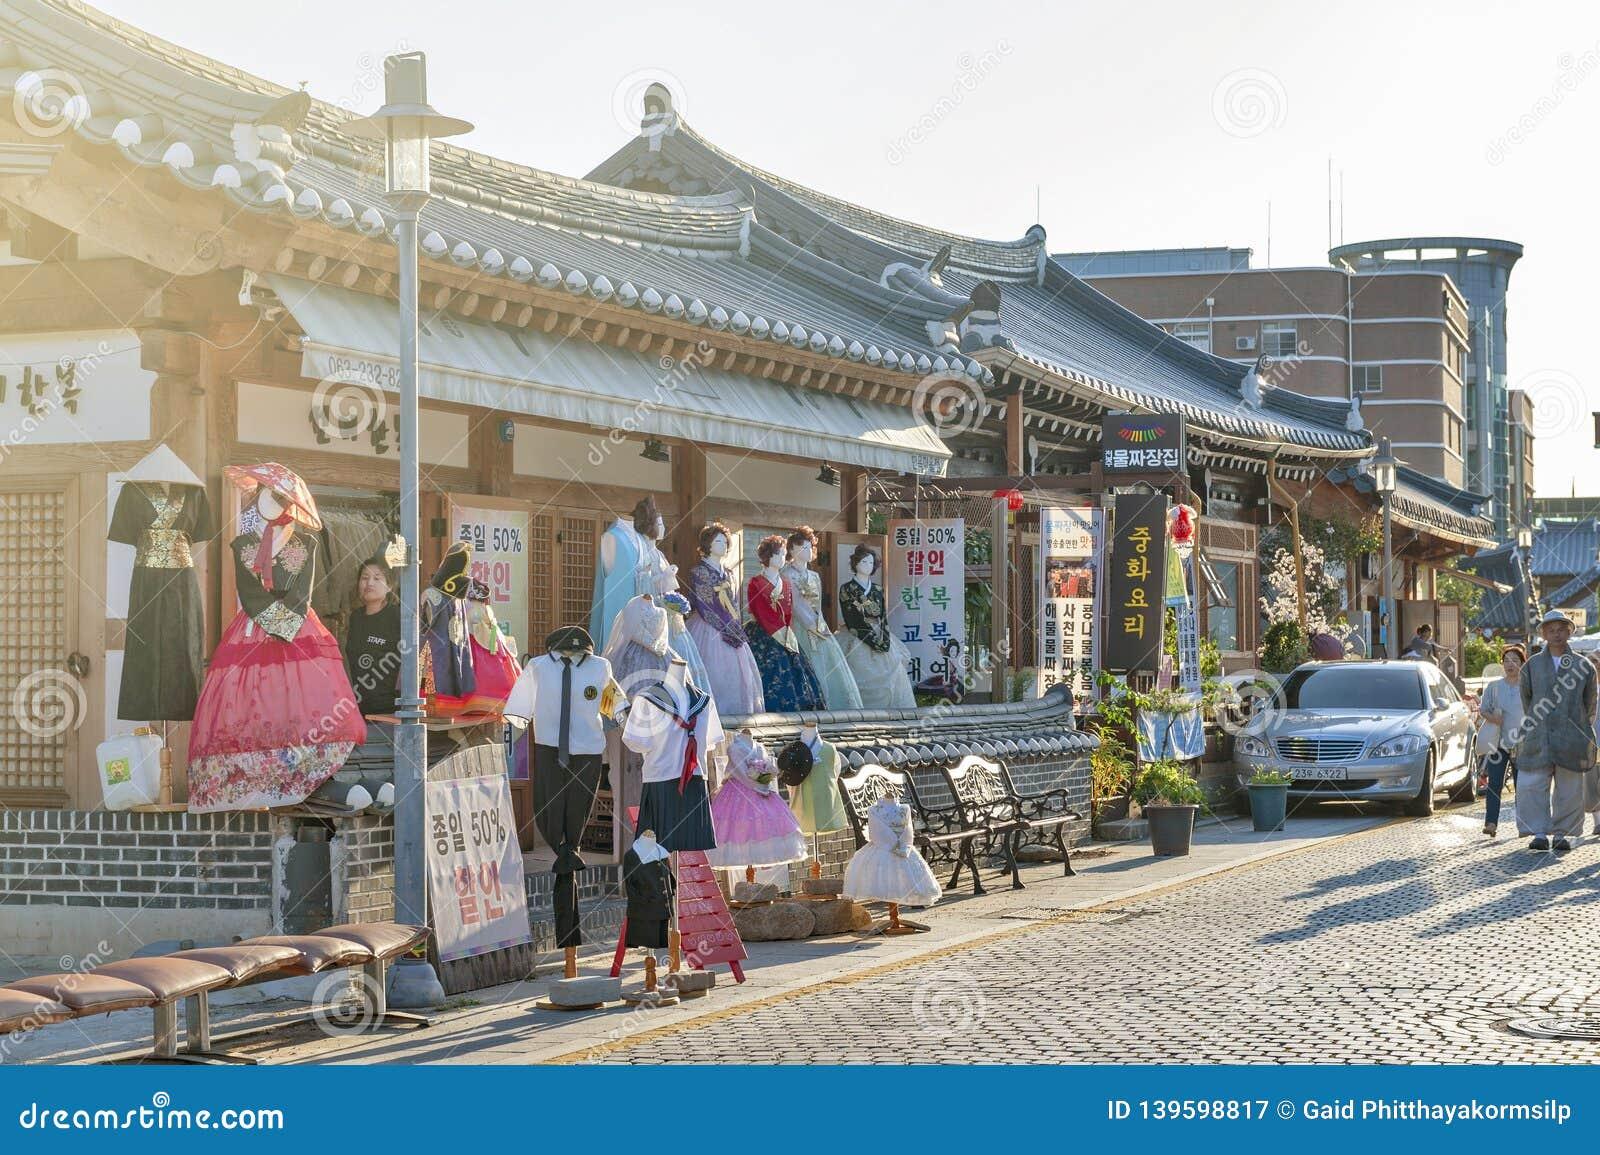 Hanboknam Korean traditional dress rental shop in Jeonju Hanok Village, South Korea